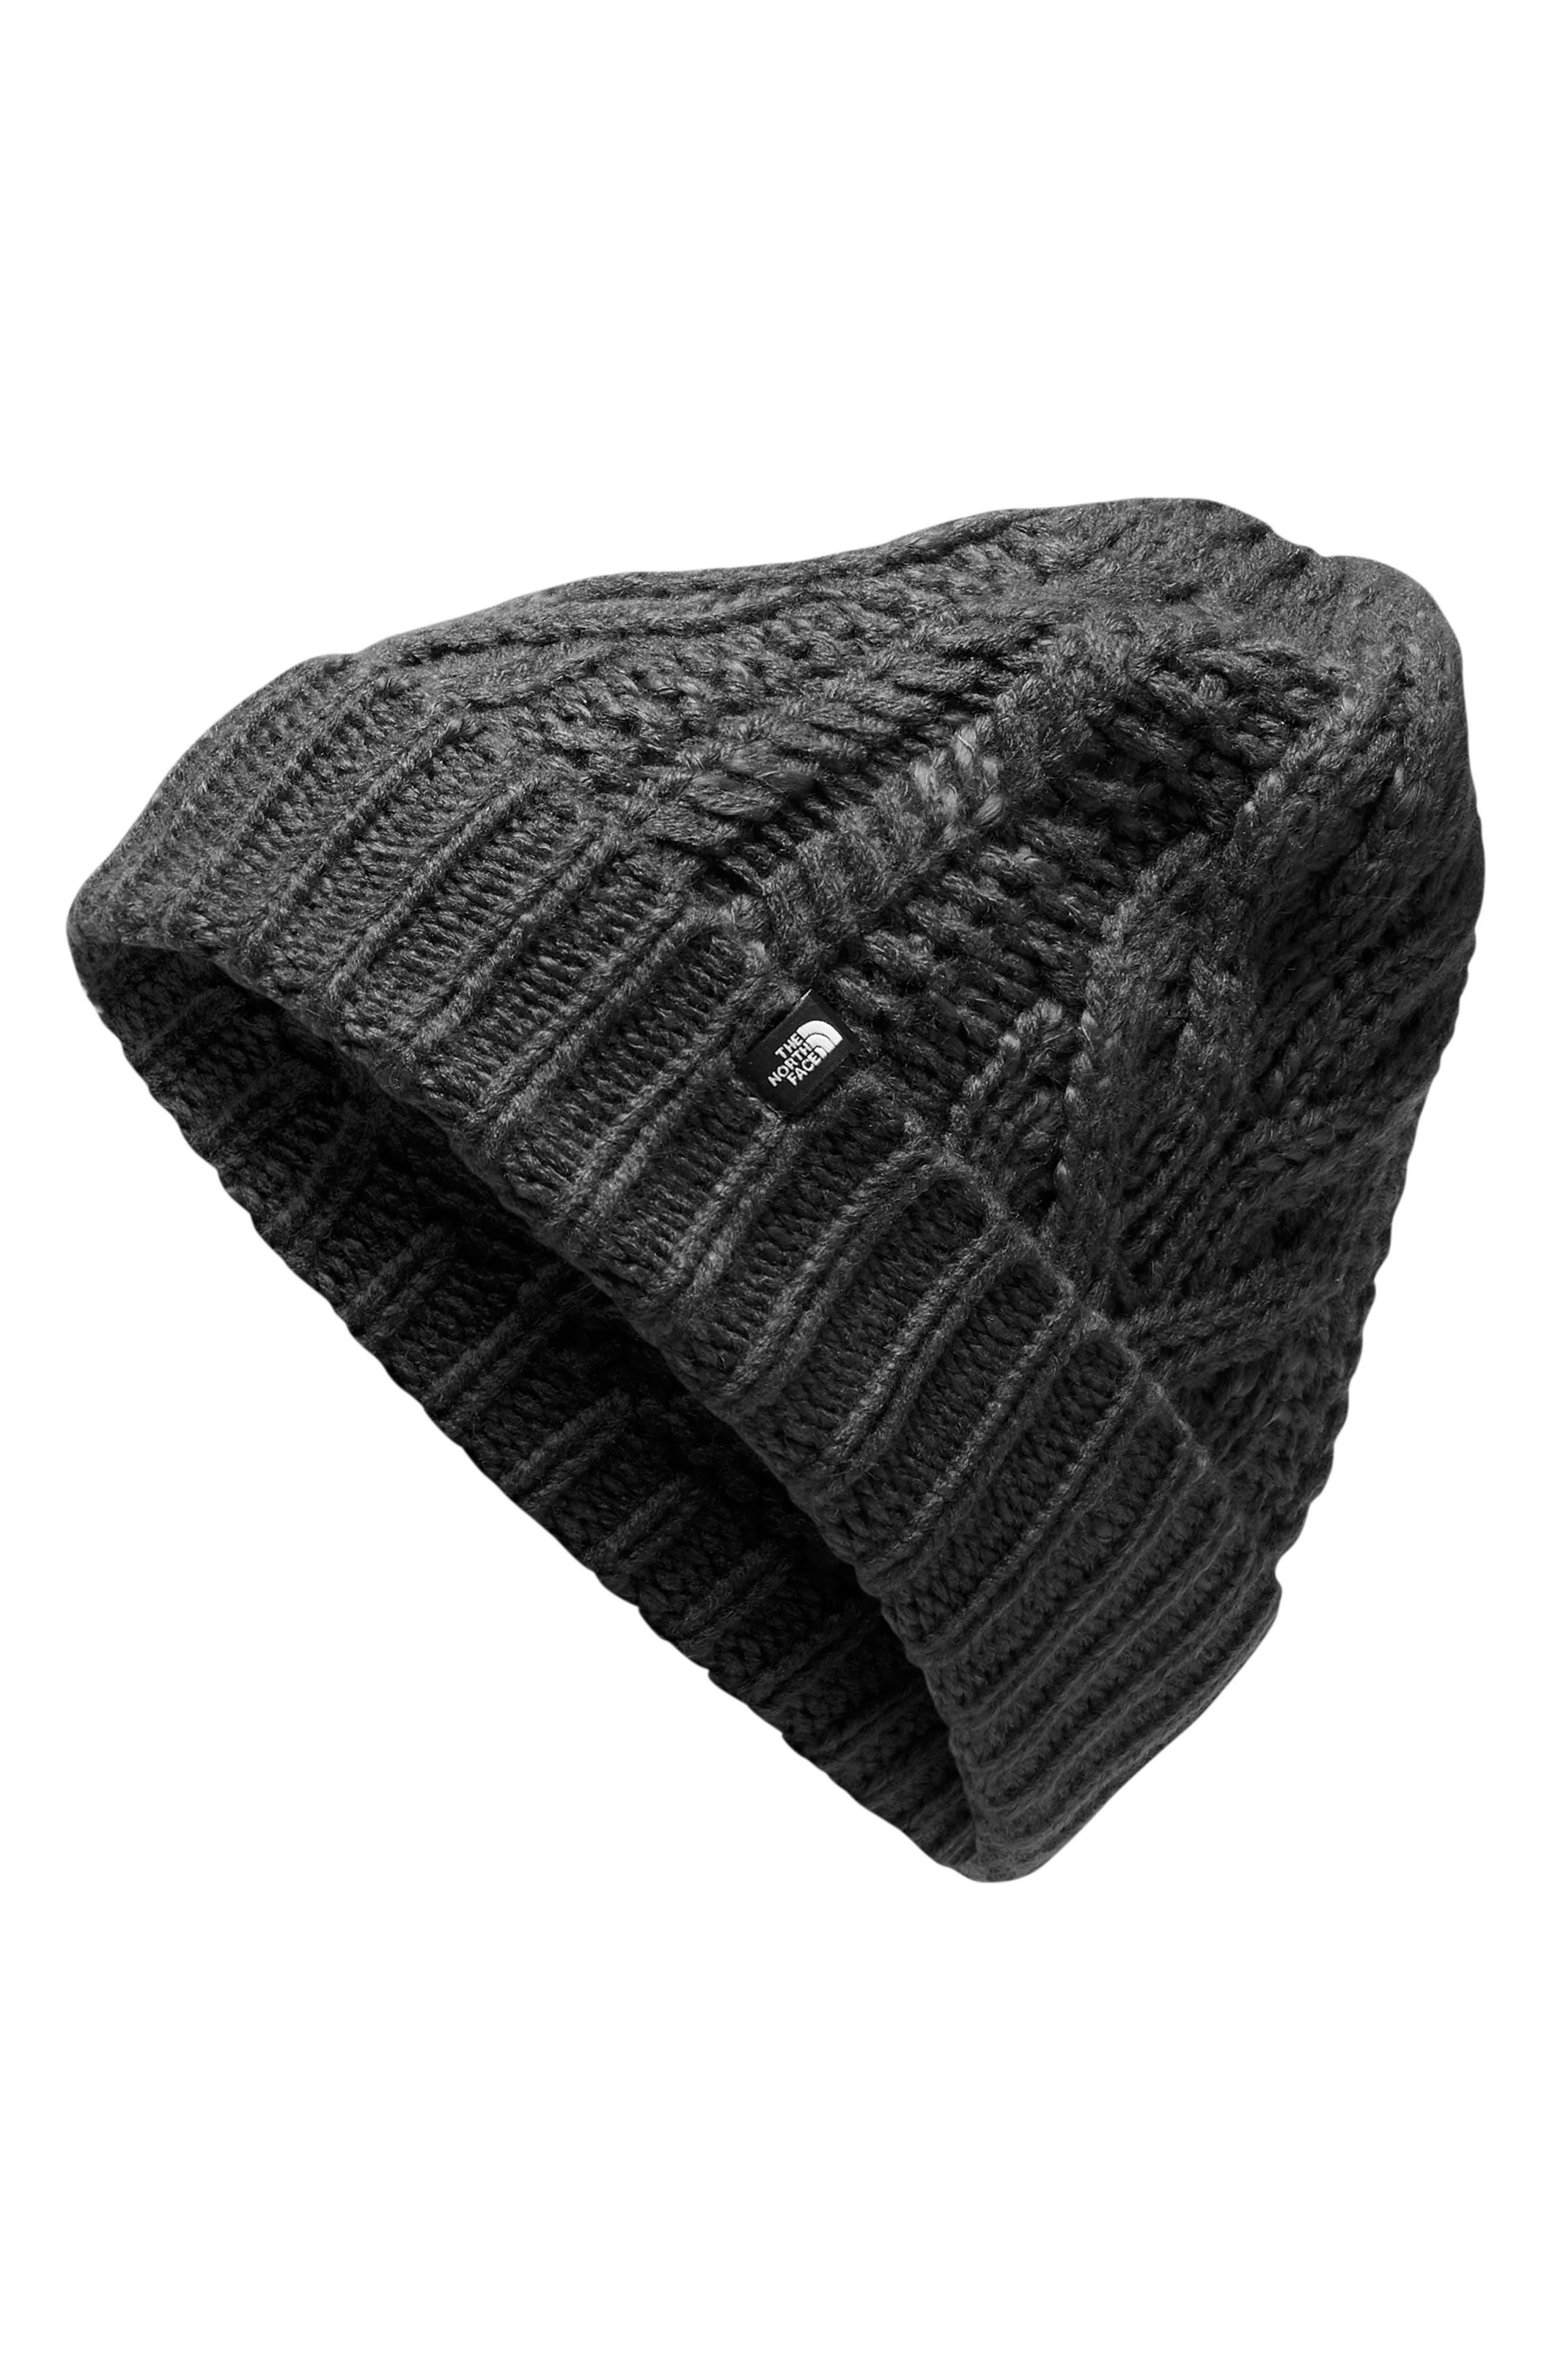 Minna Cable Knit Beanie,                             Main thumbnail 1, color,                             TNF BLACK